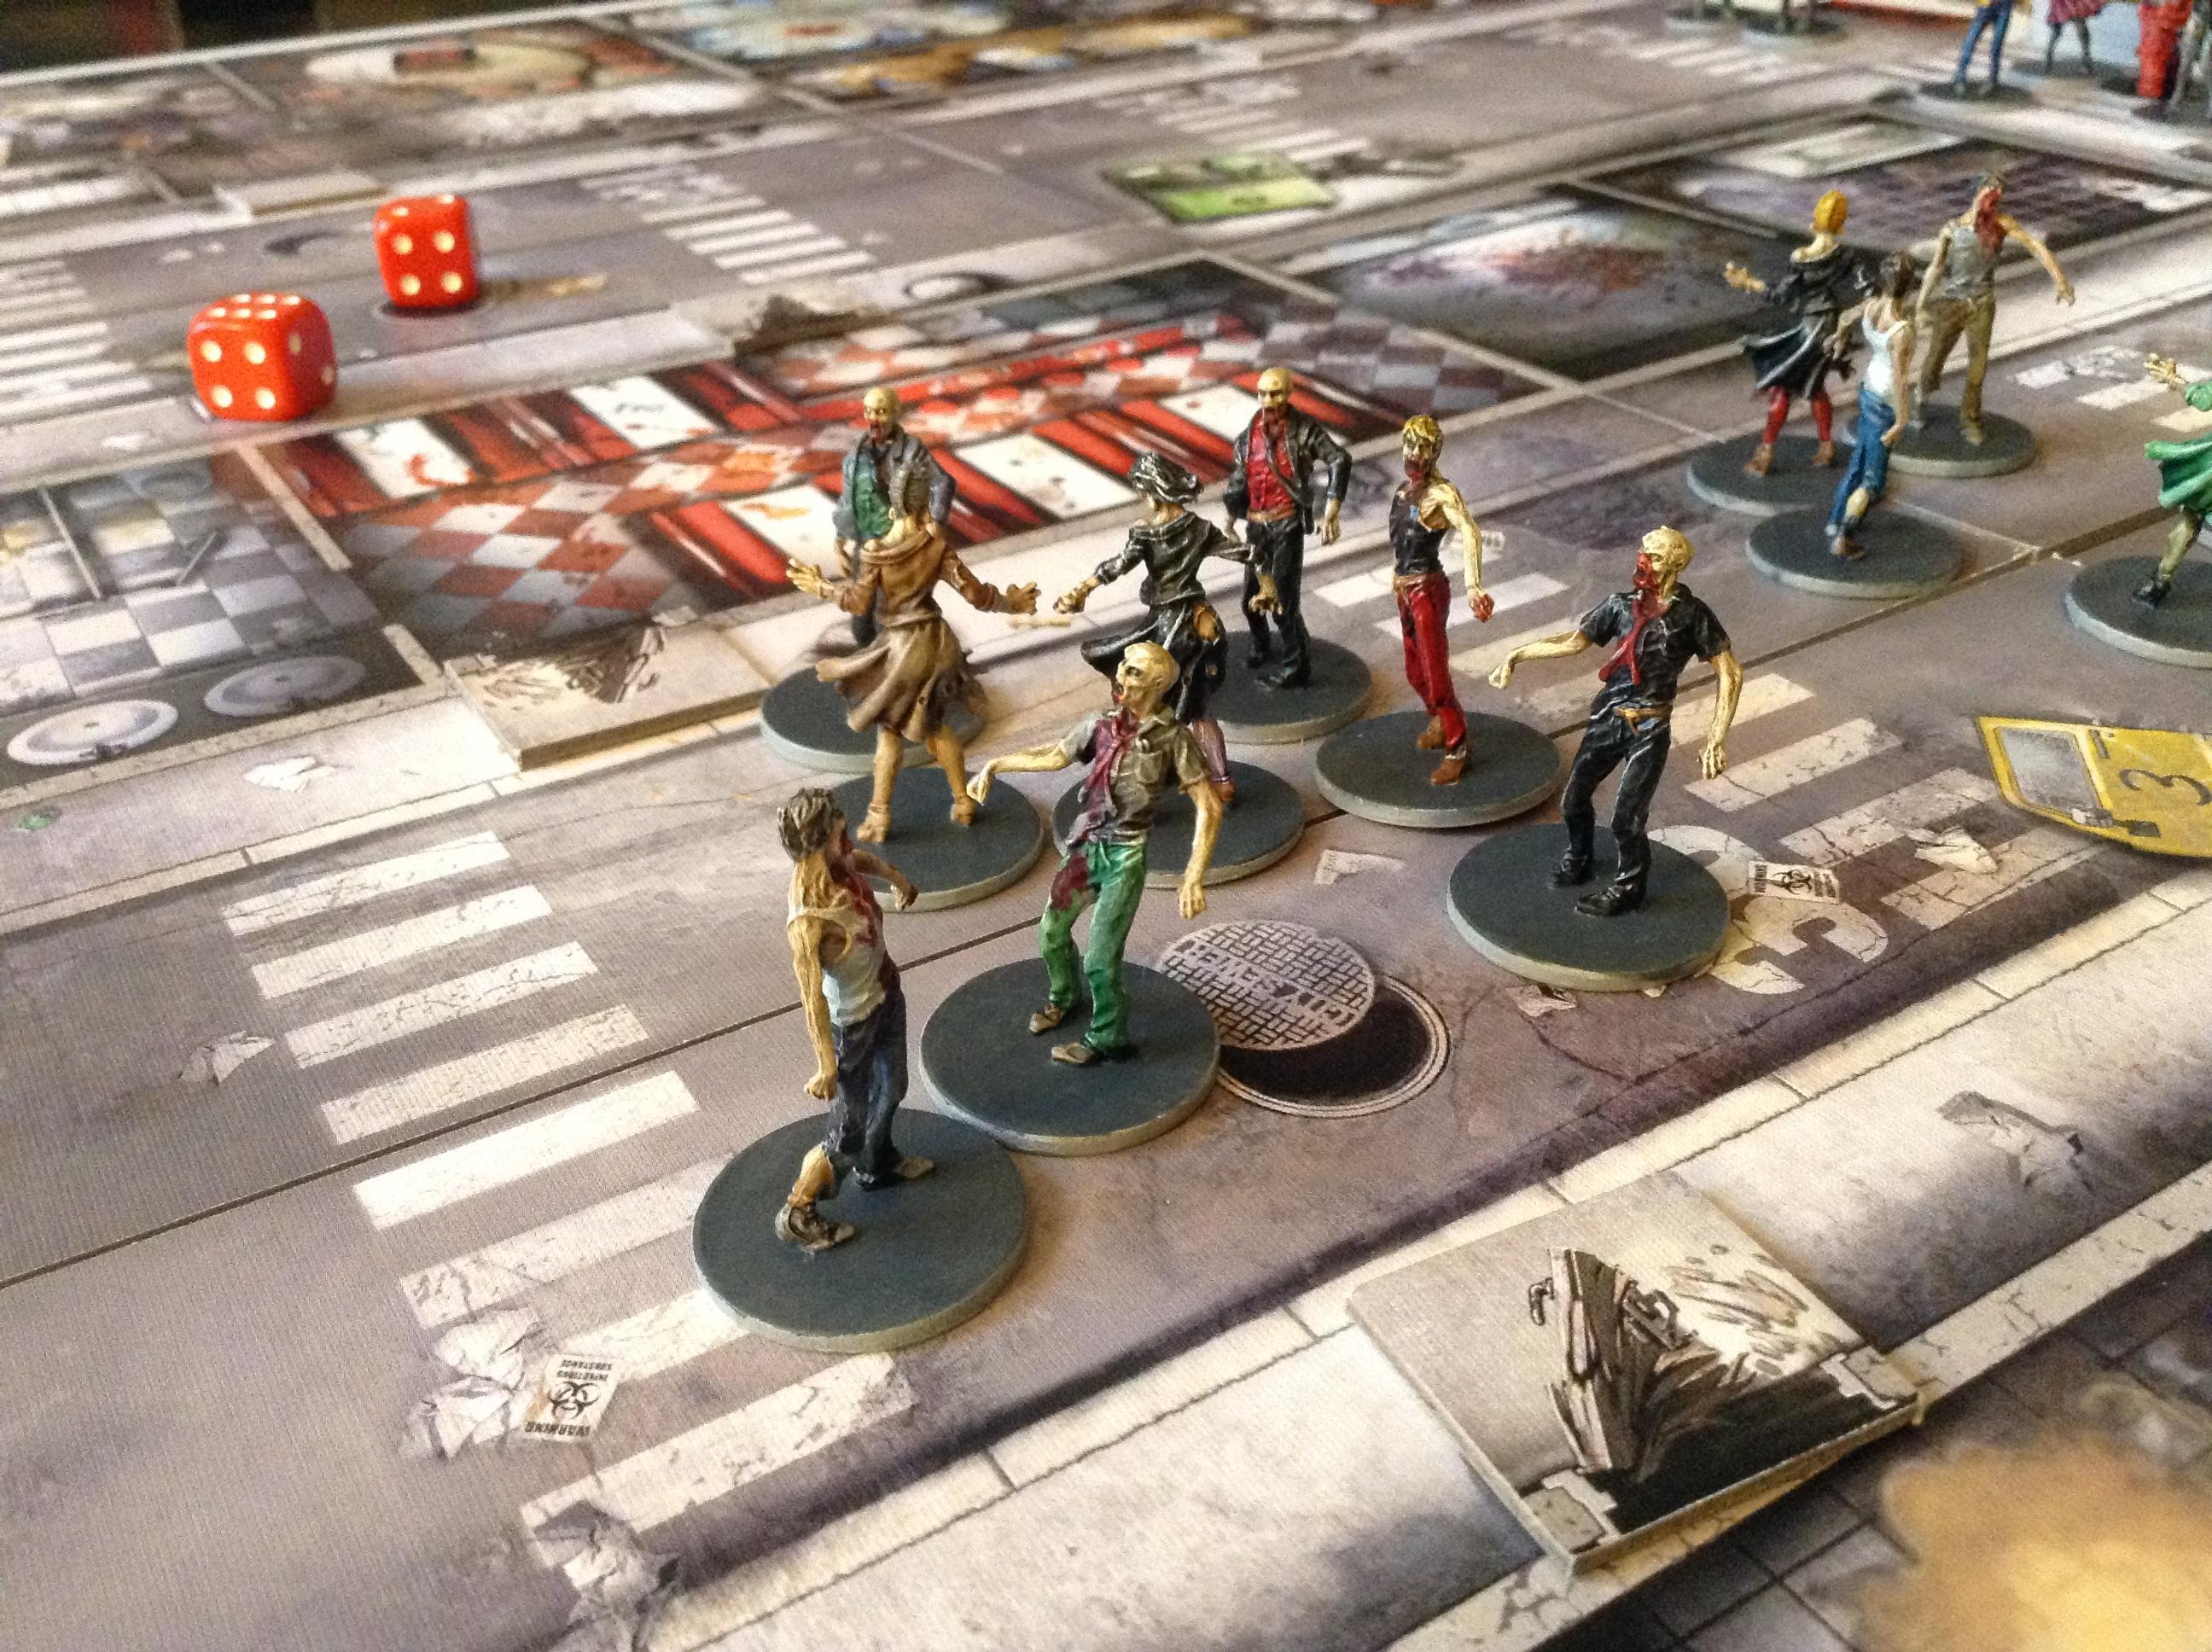 Boardgame, Mbicide, Sopravvissuti, Survivors, Zombi, Zombicide, Zombie